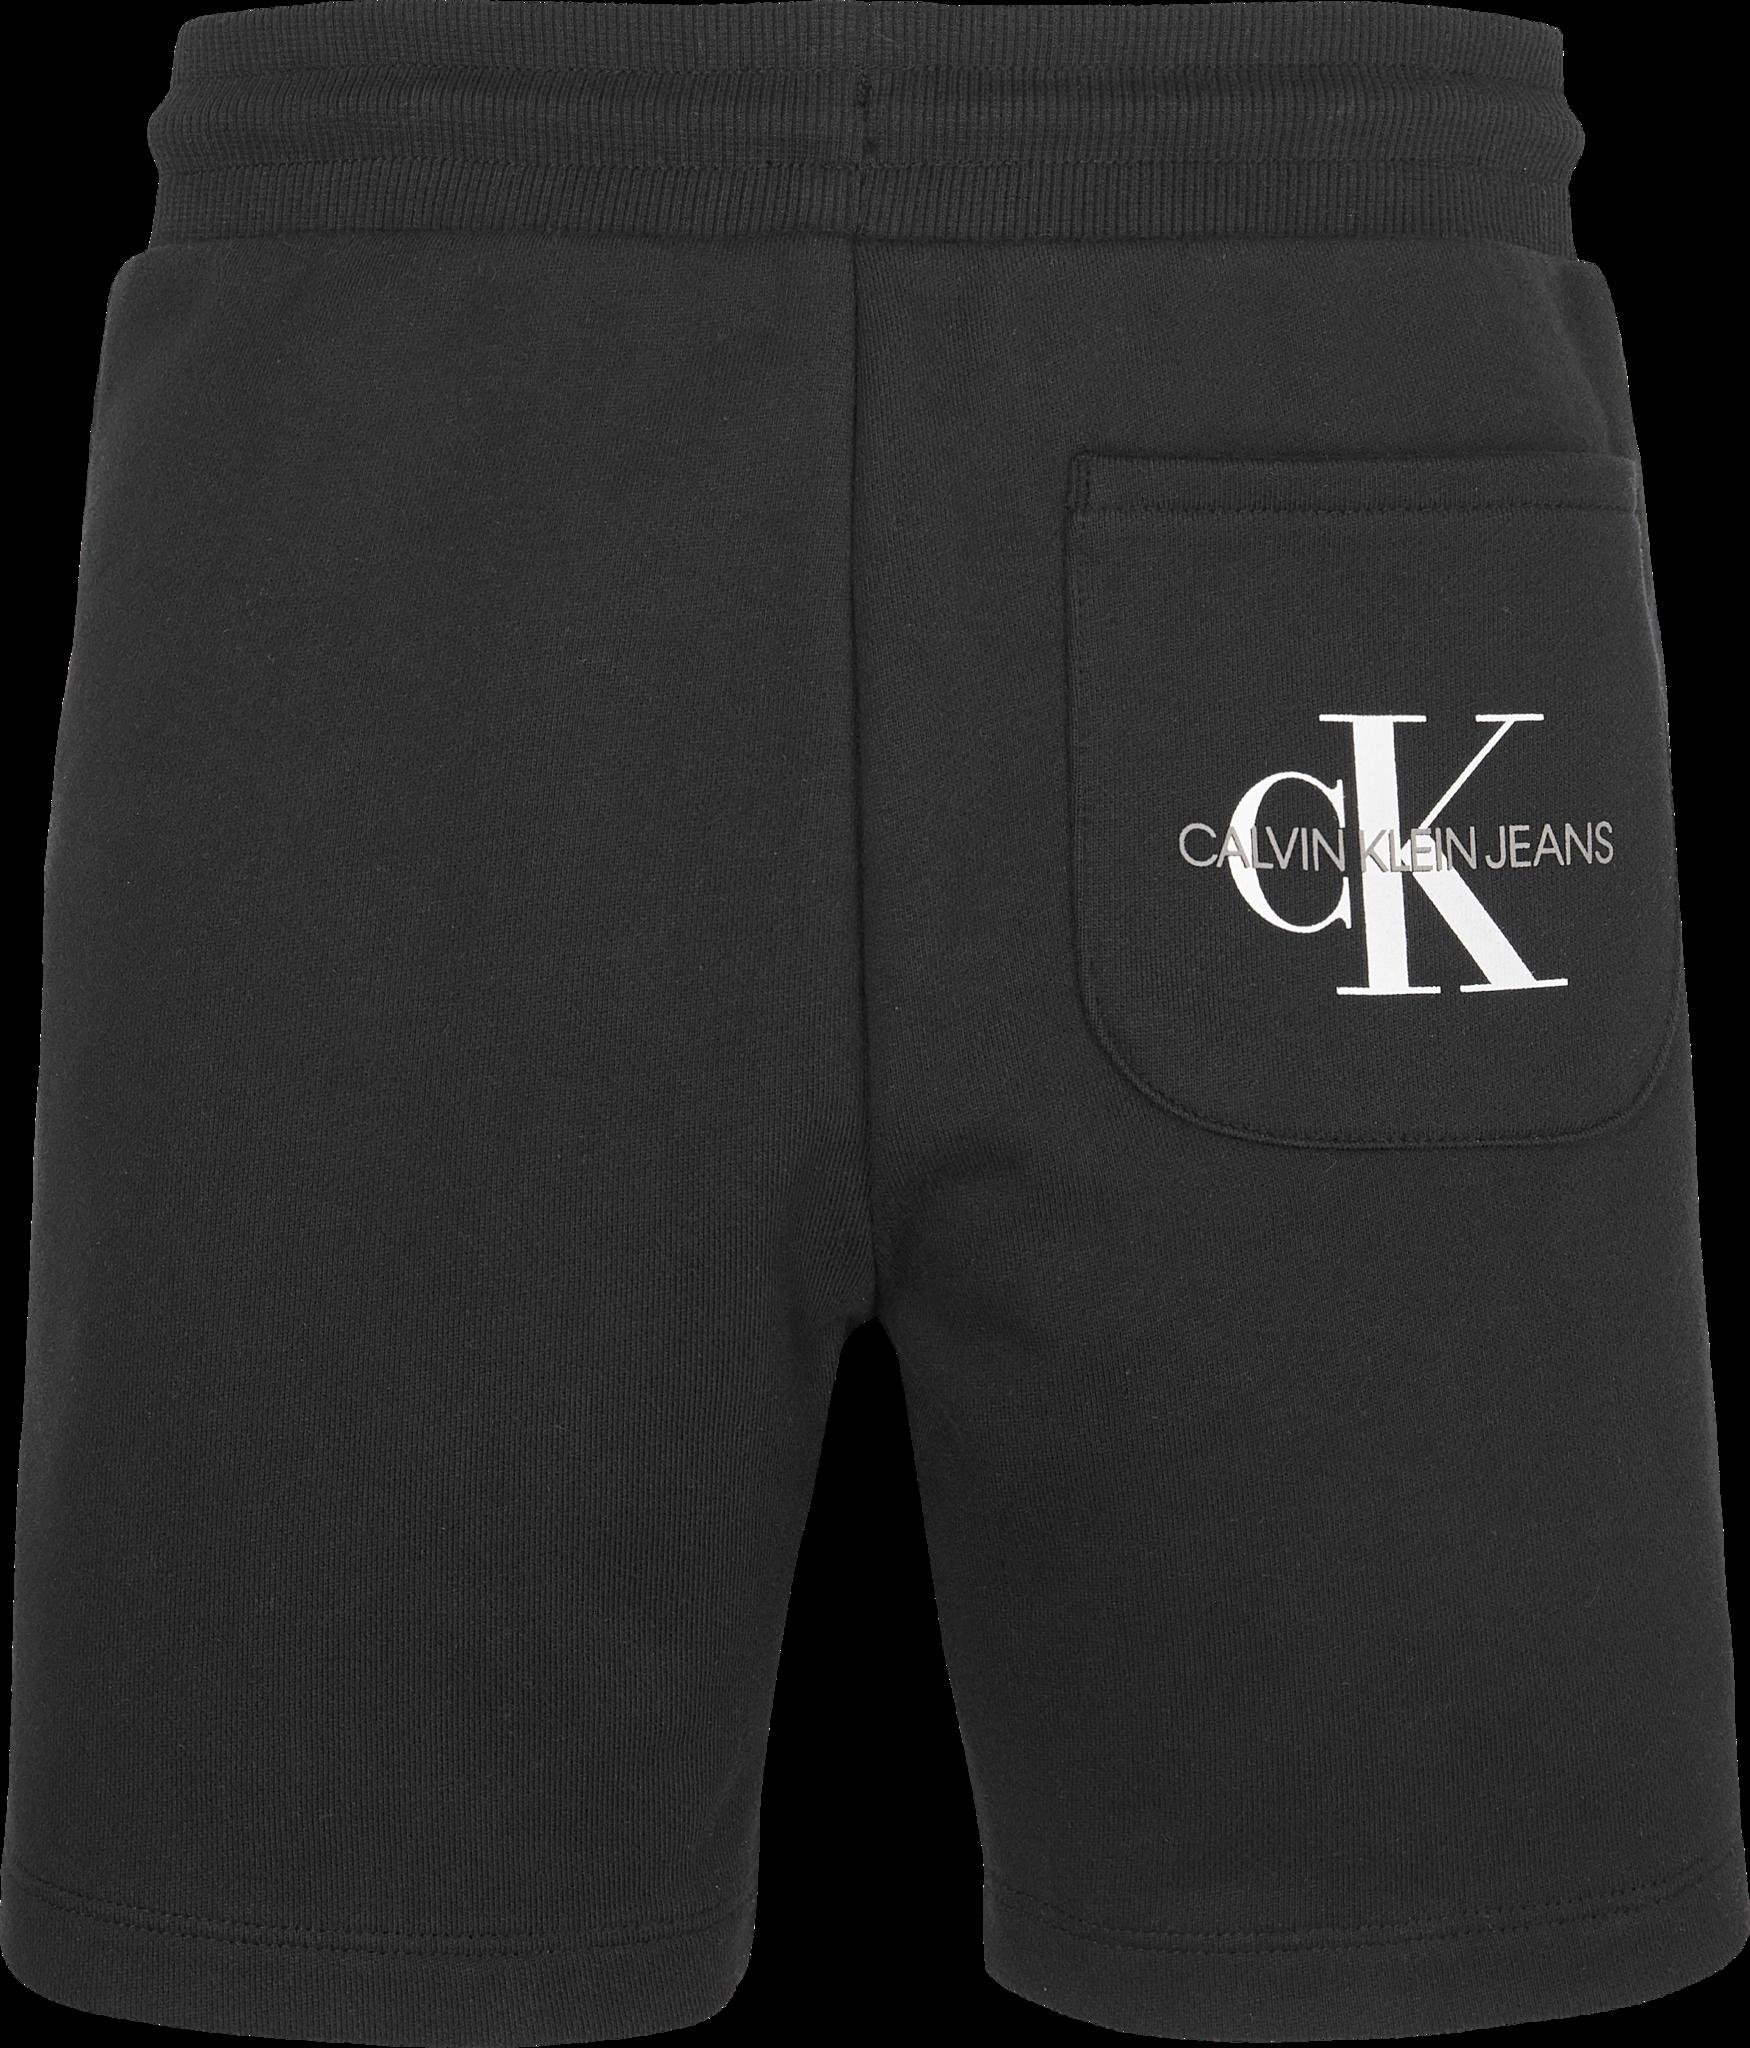 Calvin Klein Jeans Monogram Sweatshort